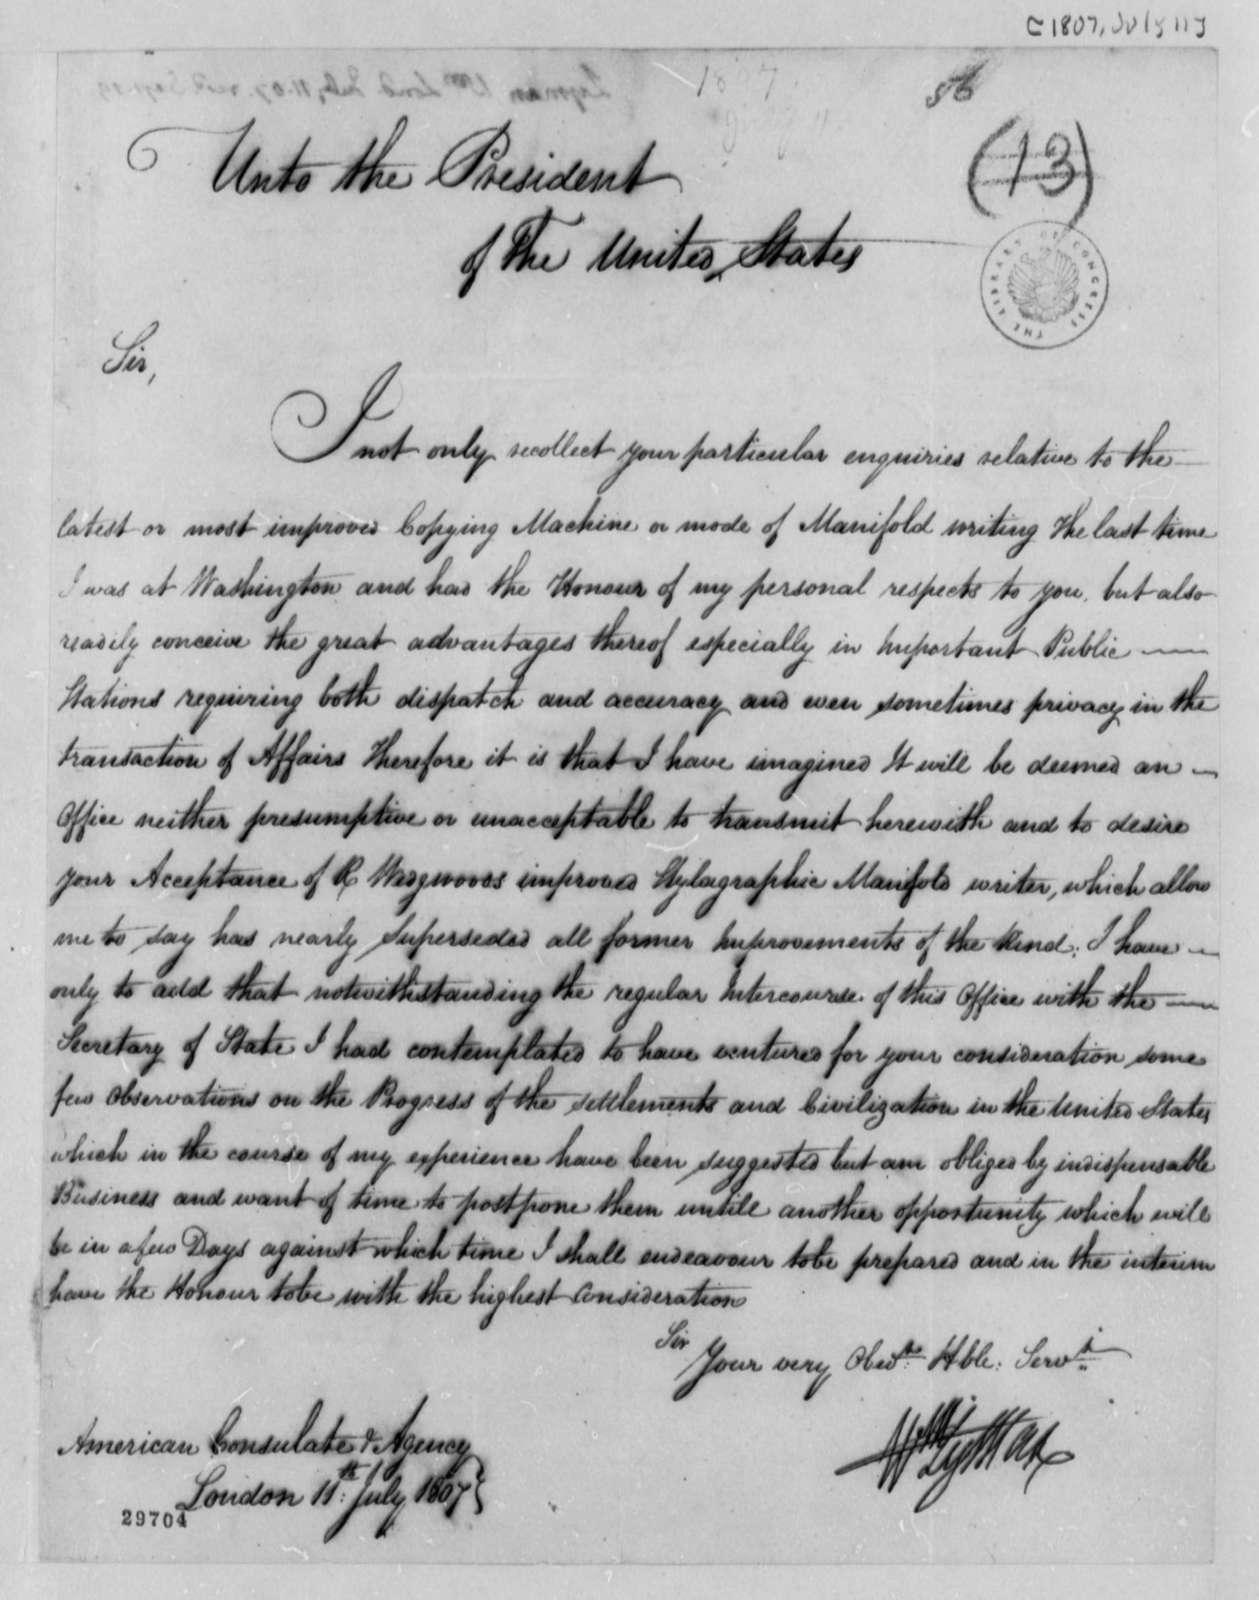 William Lyman to Thomas Jefferson, July 11, 1807